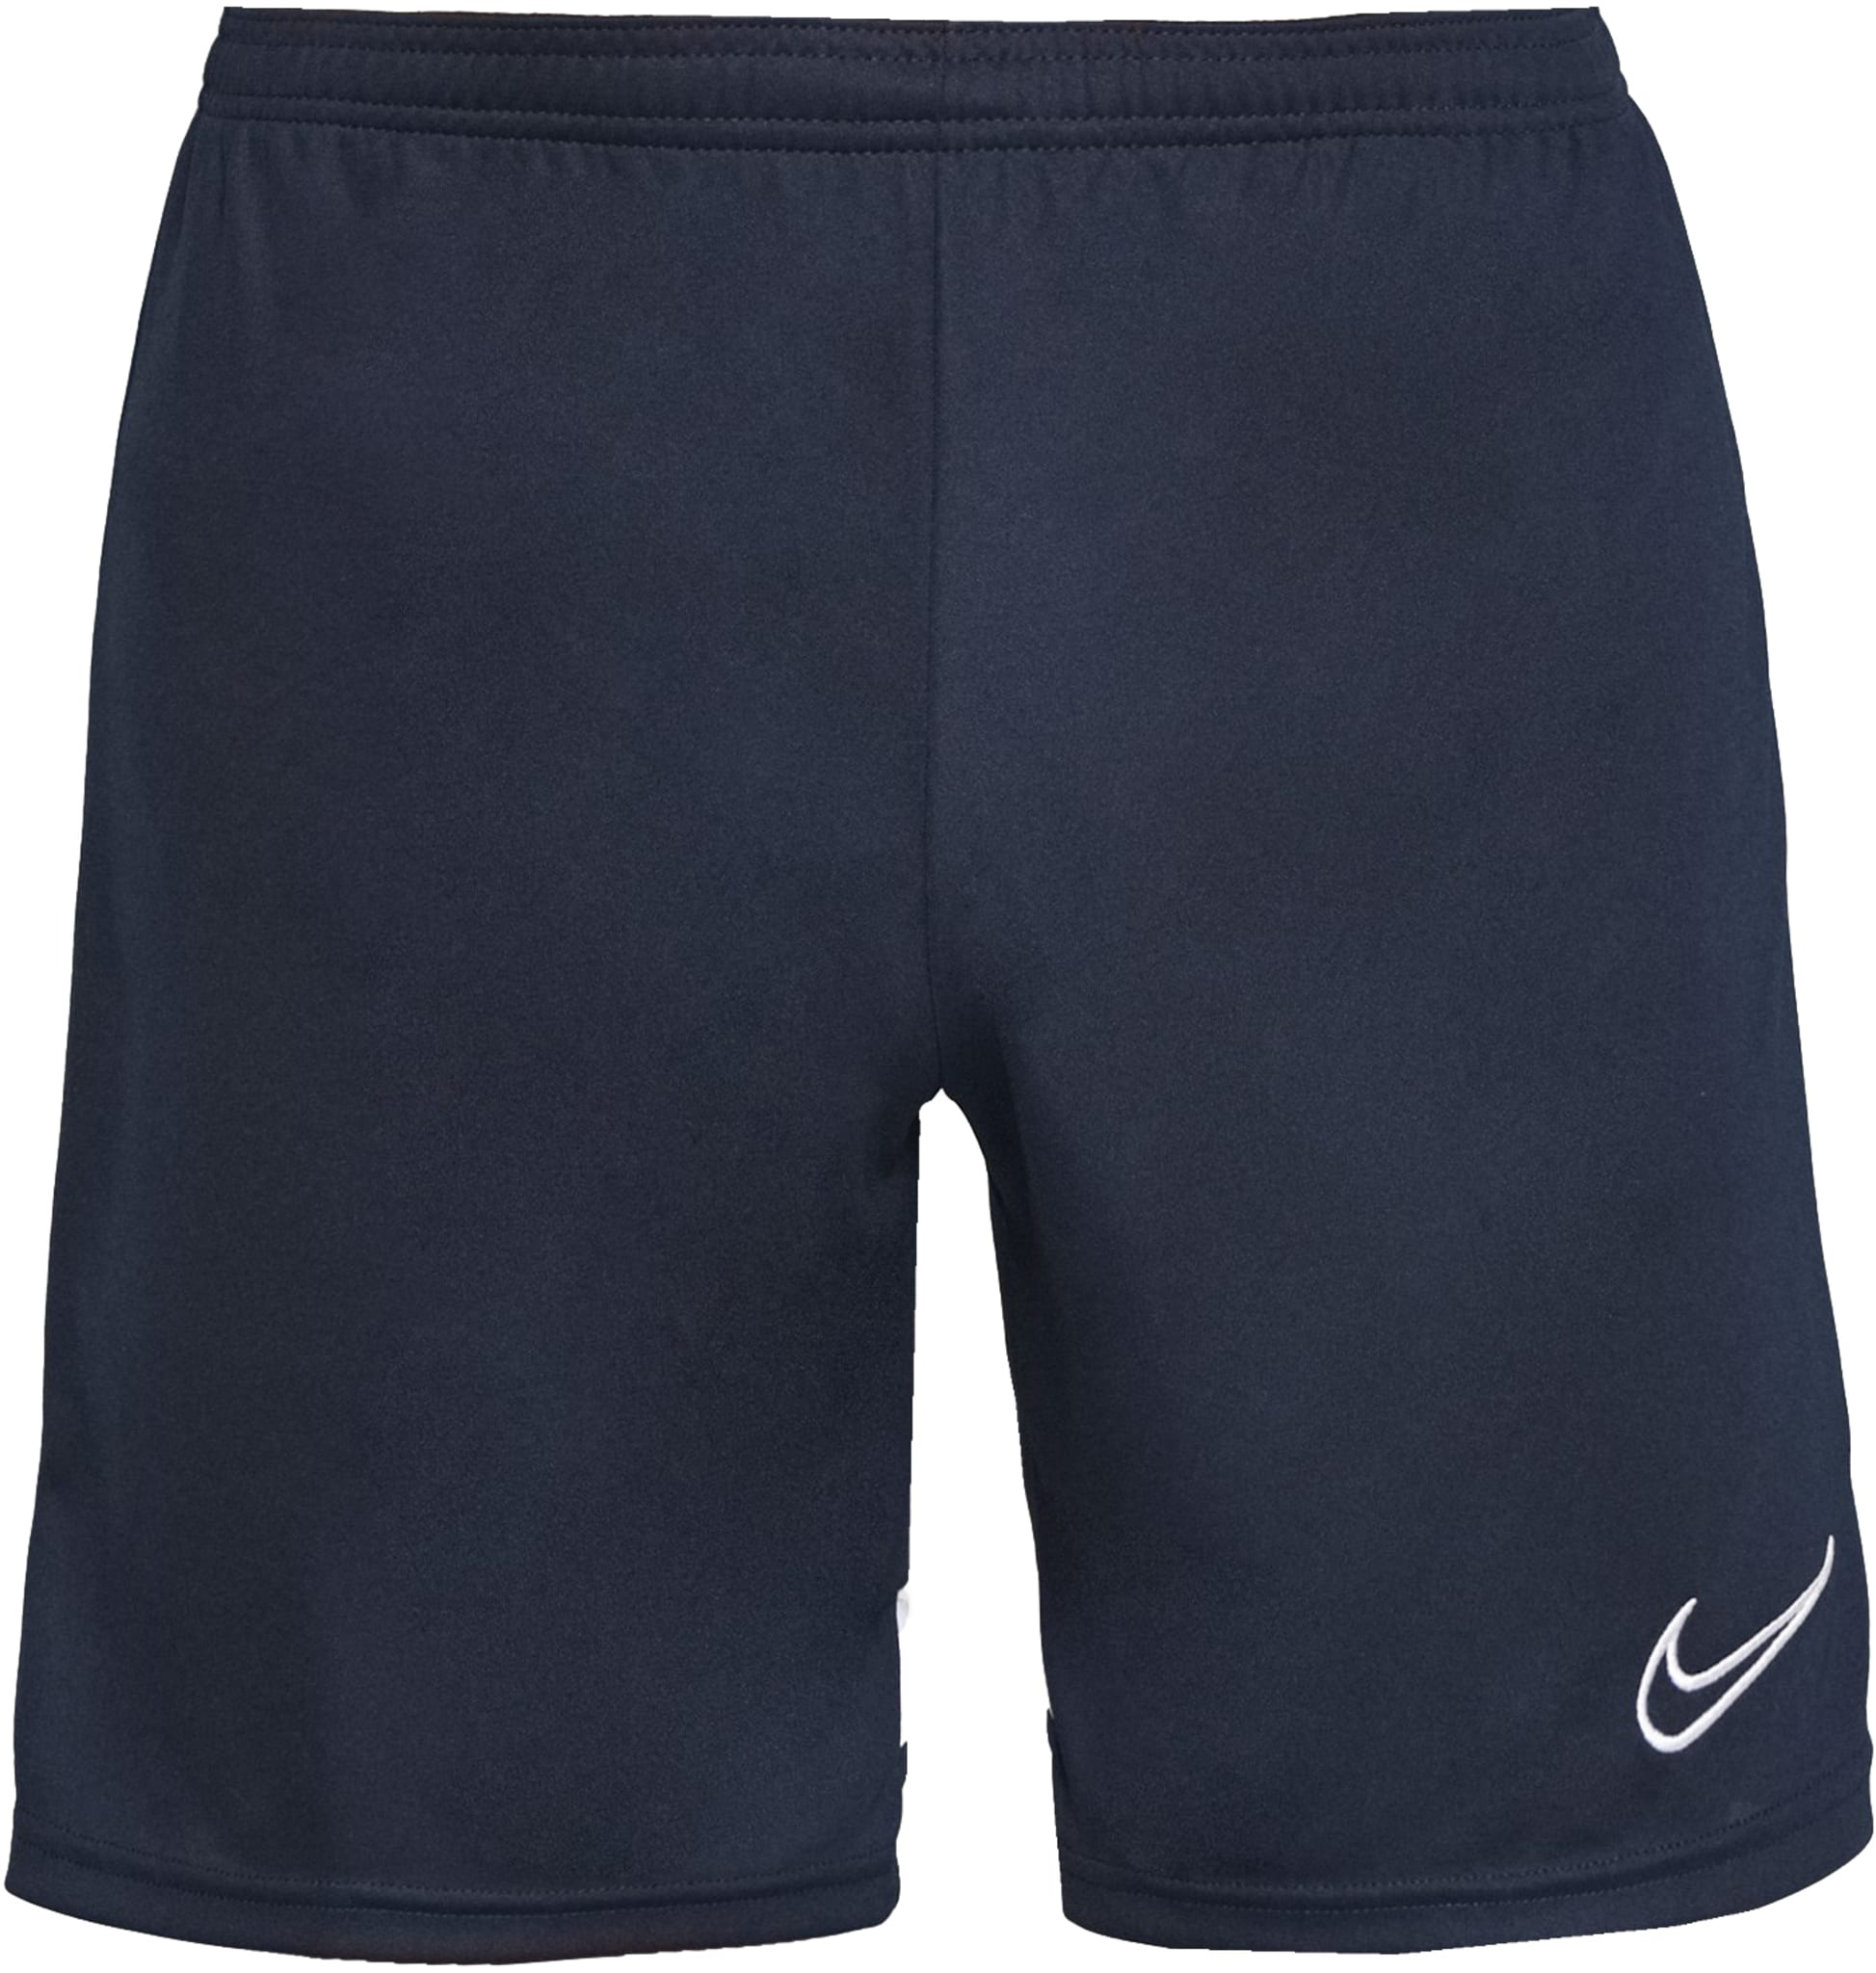 Academy Football Shorts Big Kids